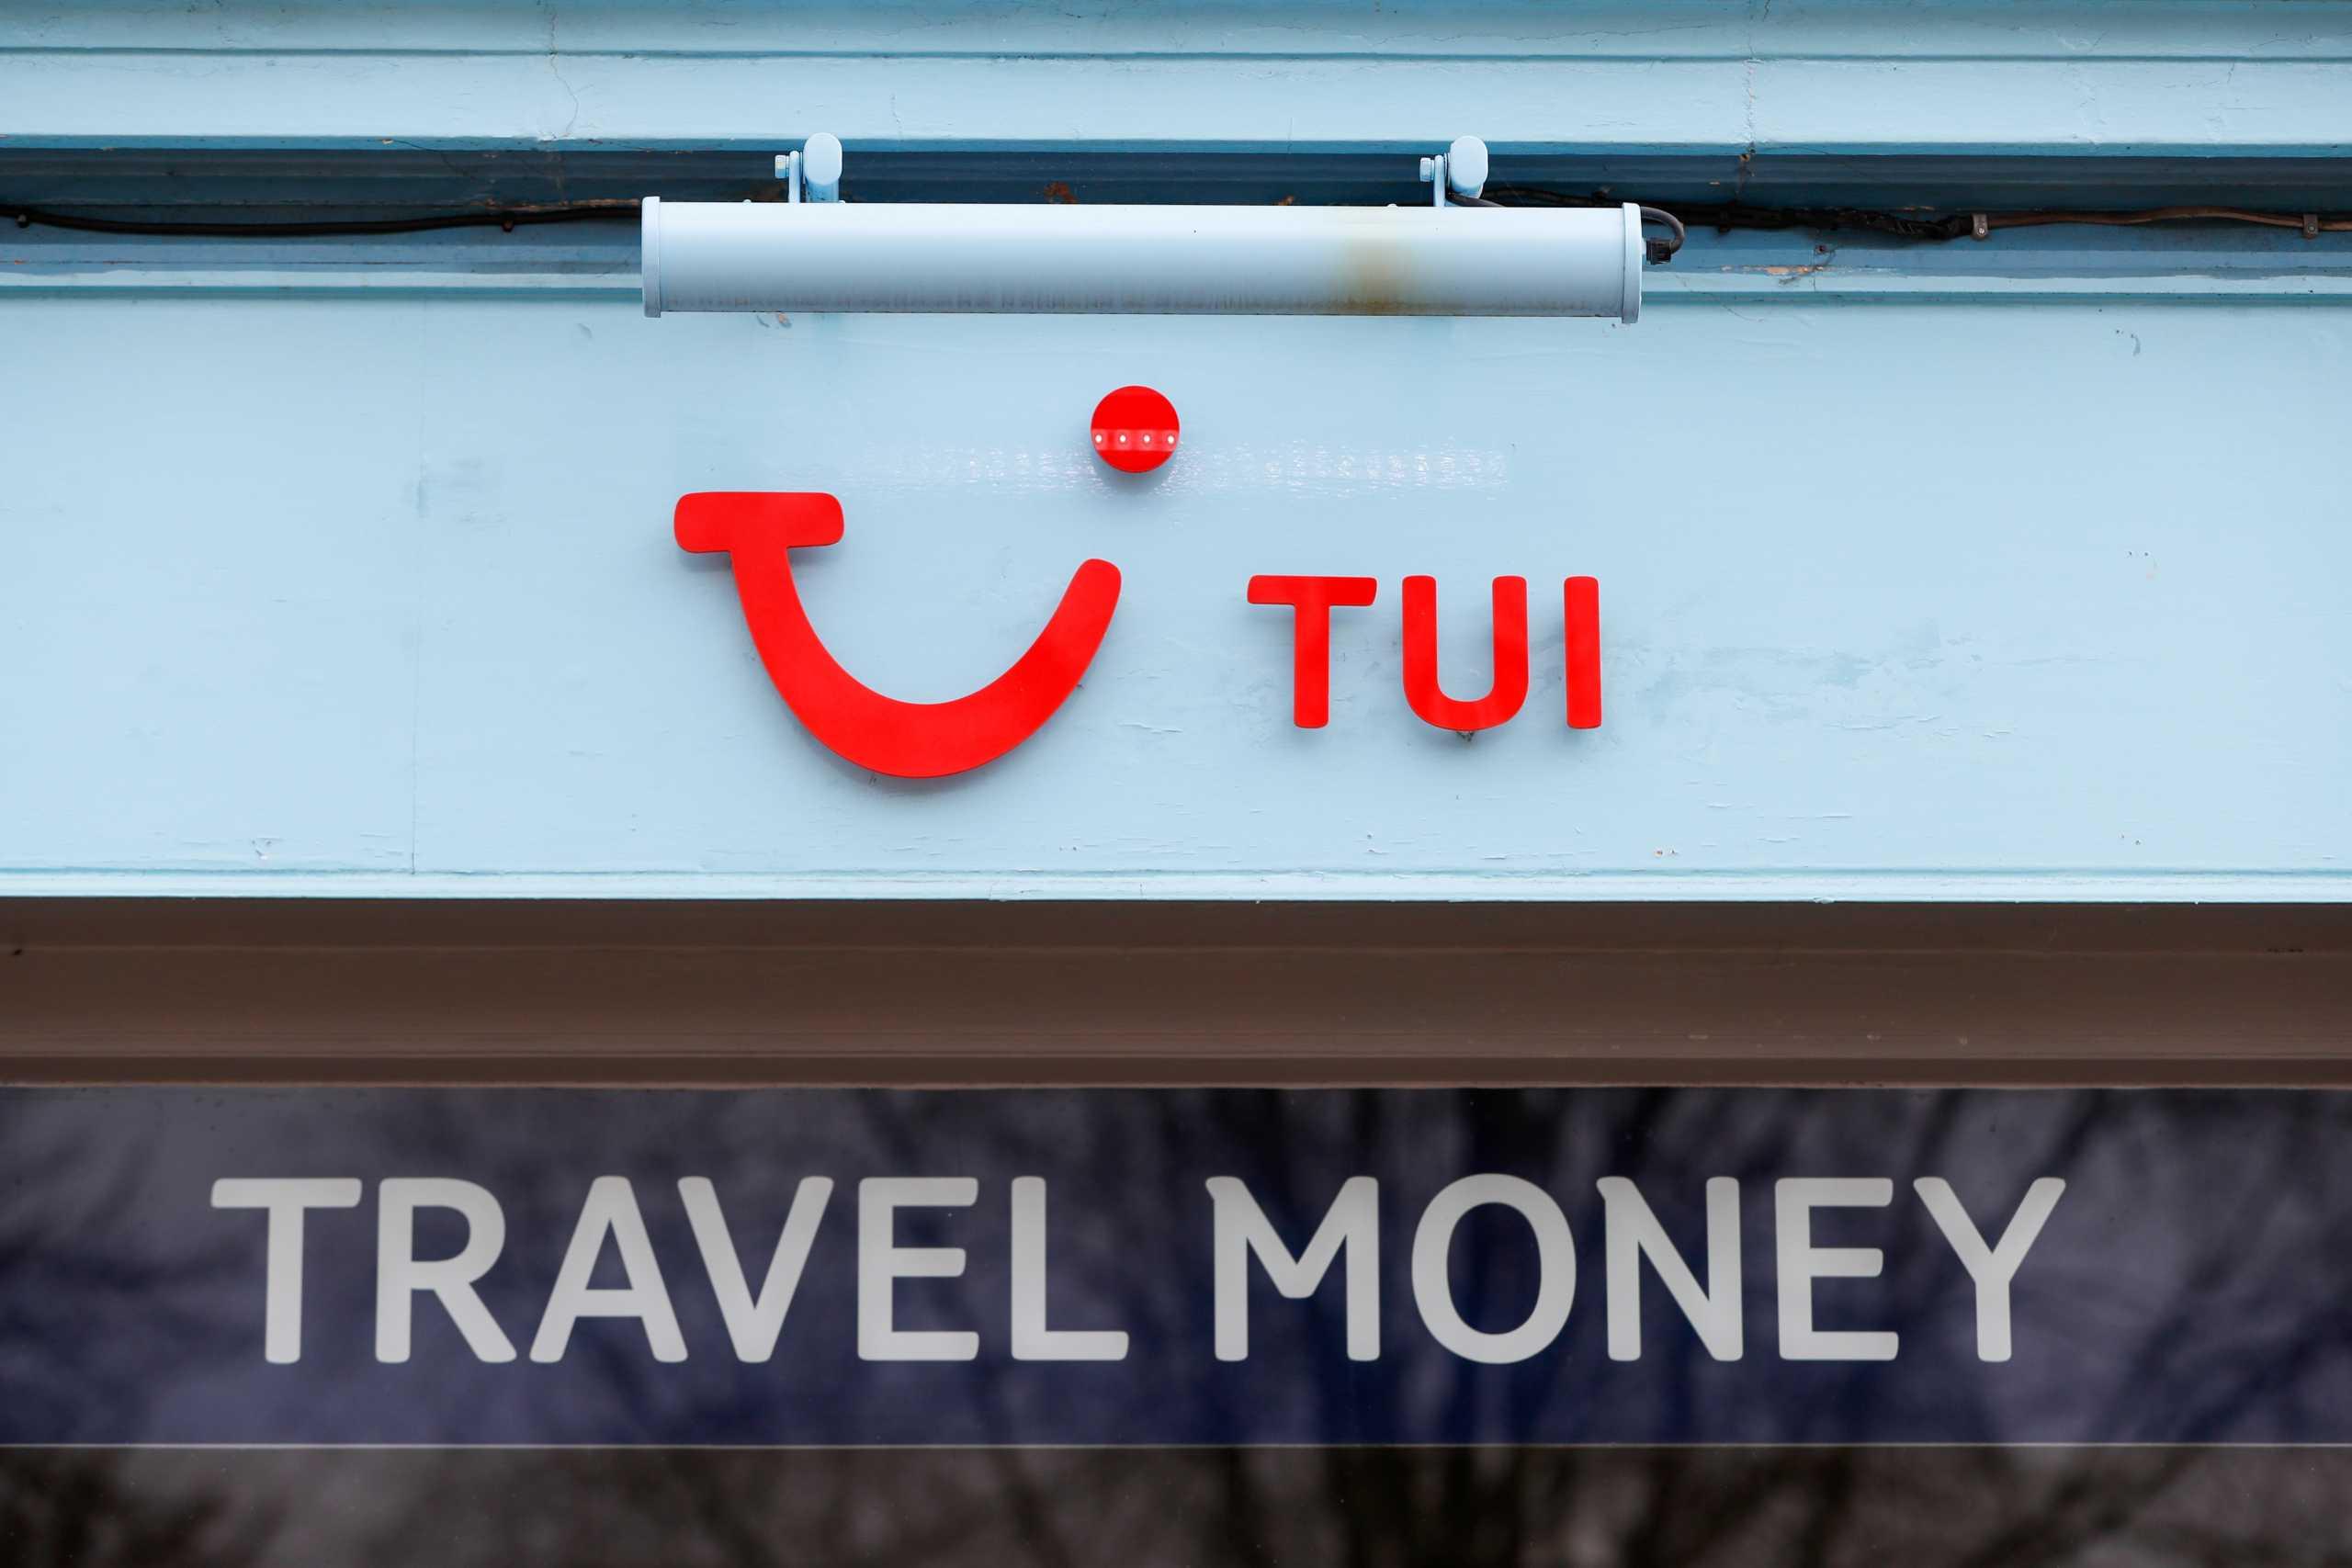 TUI: Οι κρατήσεις έχουν φθάσει στο 60% της προ κρίσης εποχής